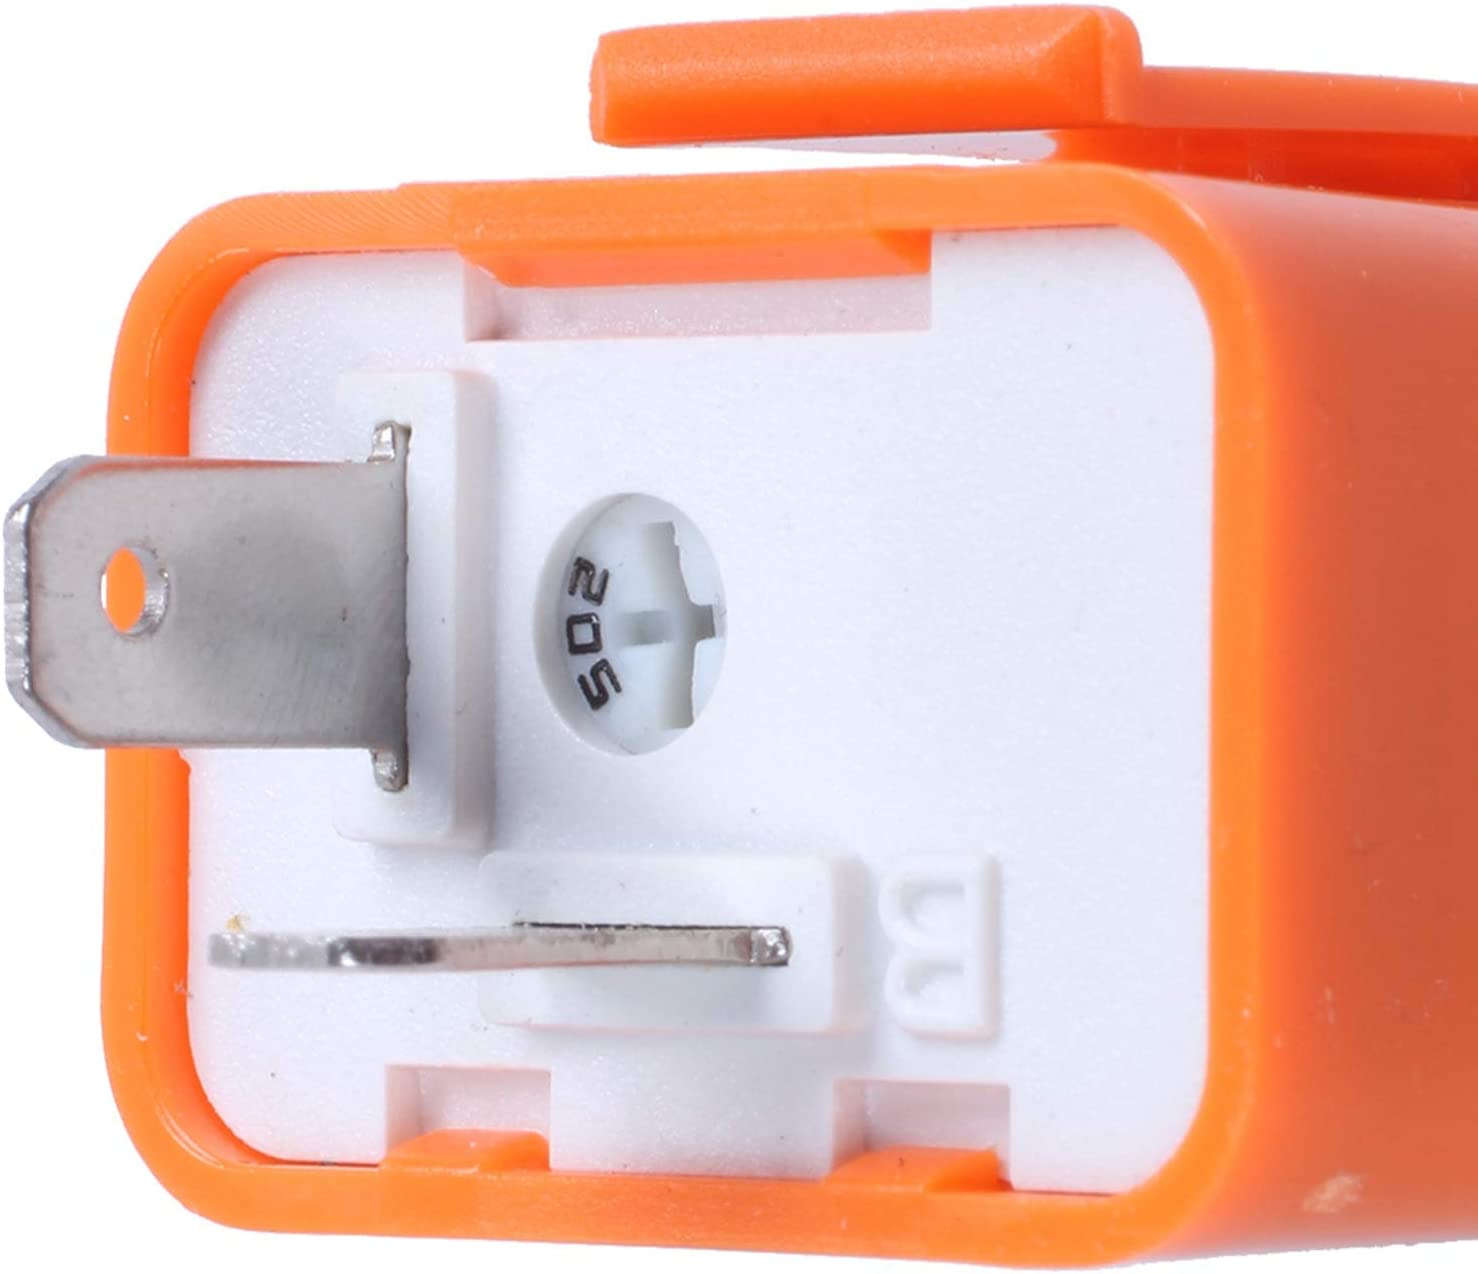 ACAMPTAR Flasher de 2 Pin para Coche Motocicleta Luz LED Indicador de Velocidad Ajustable Luz de Giro del rele Intermitente Naranja